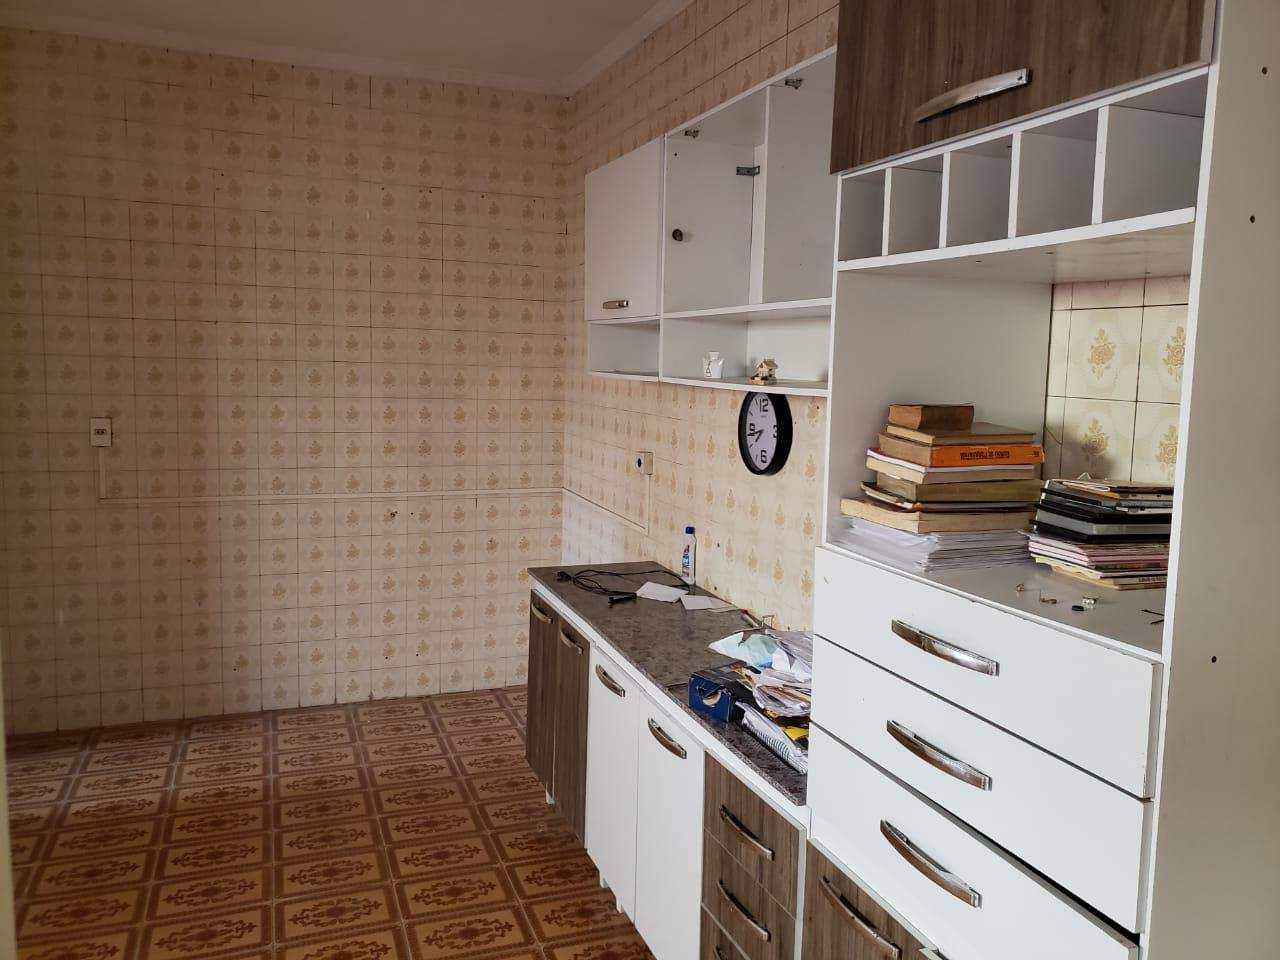 Casa com 3 dorms, Jardim Vera Cruz(Zona Leste), São Paulo - R$ 340 mil, Cod: 11305